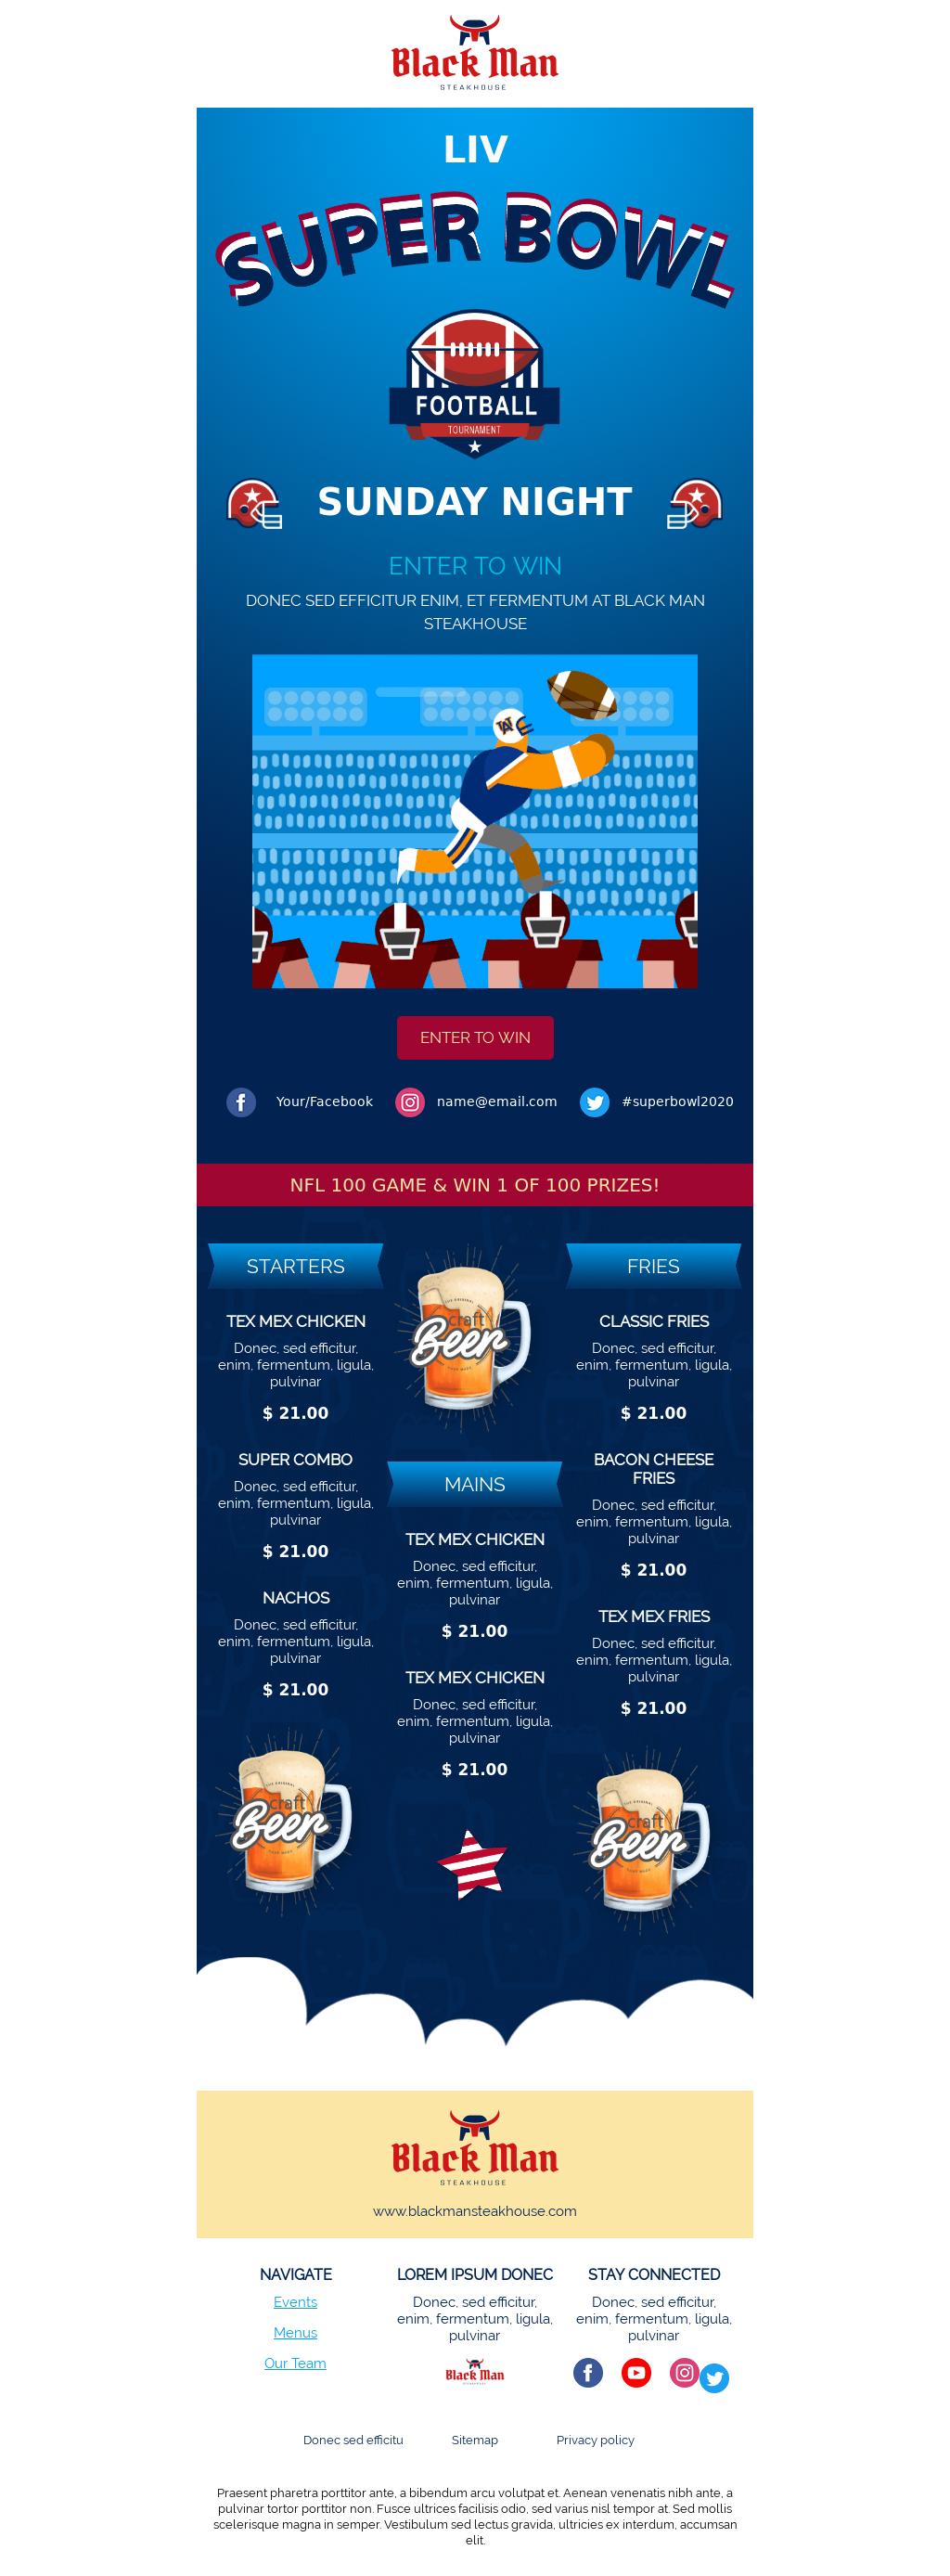 Super Bowl BLUE Event Invitation Email Template